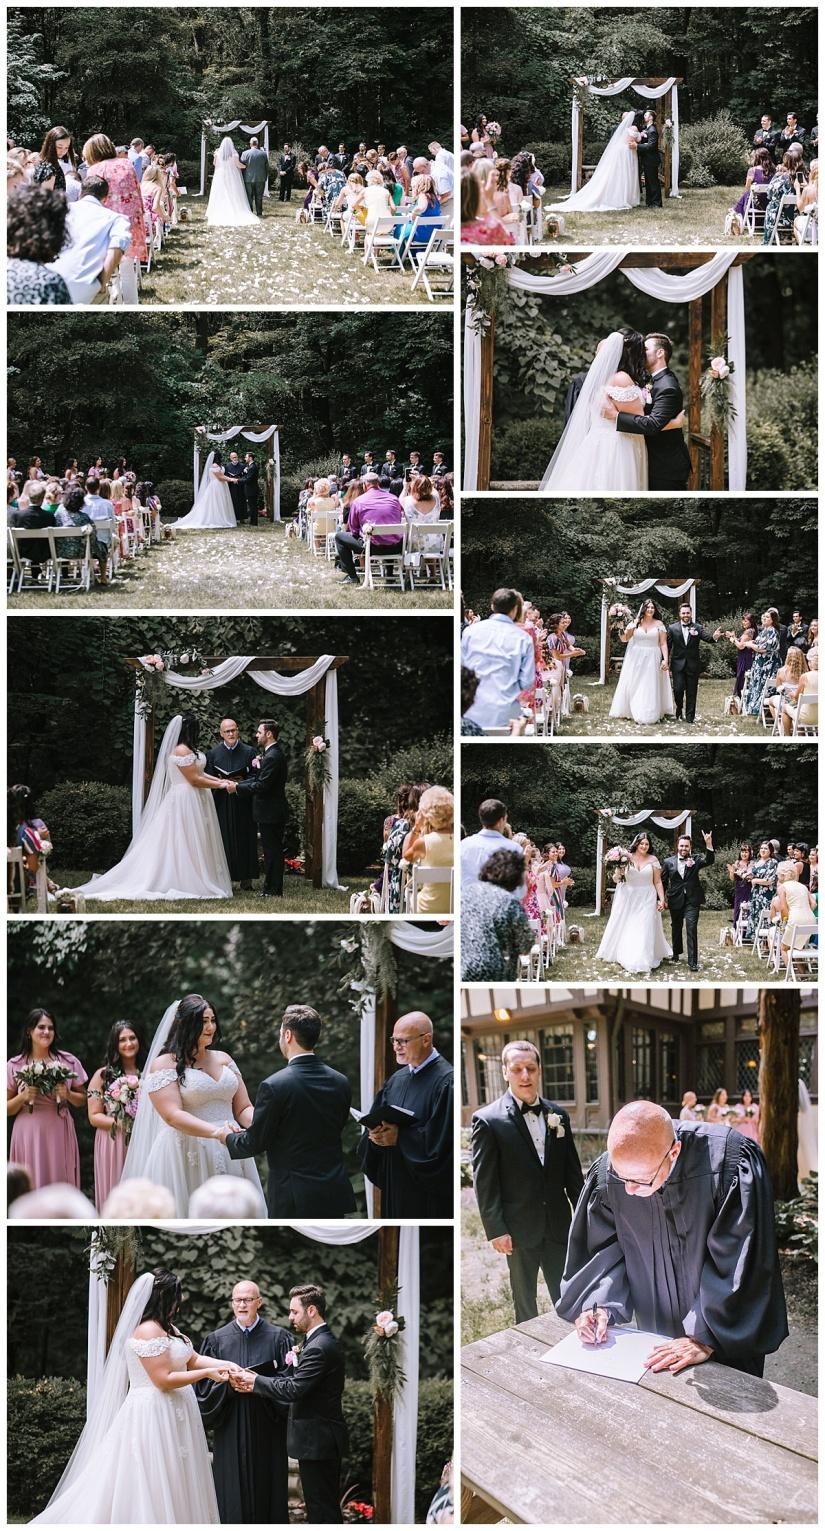 Wildwood Cultural Center - Mentor, Ohio - Northeast Ohio Wedding Photographer